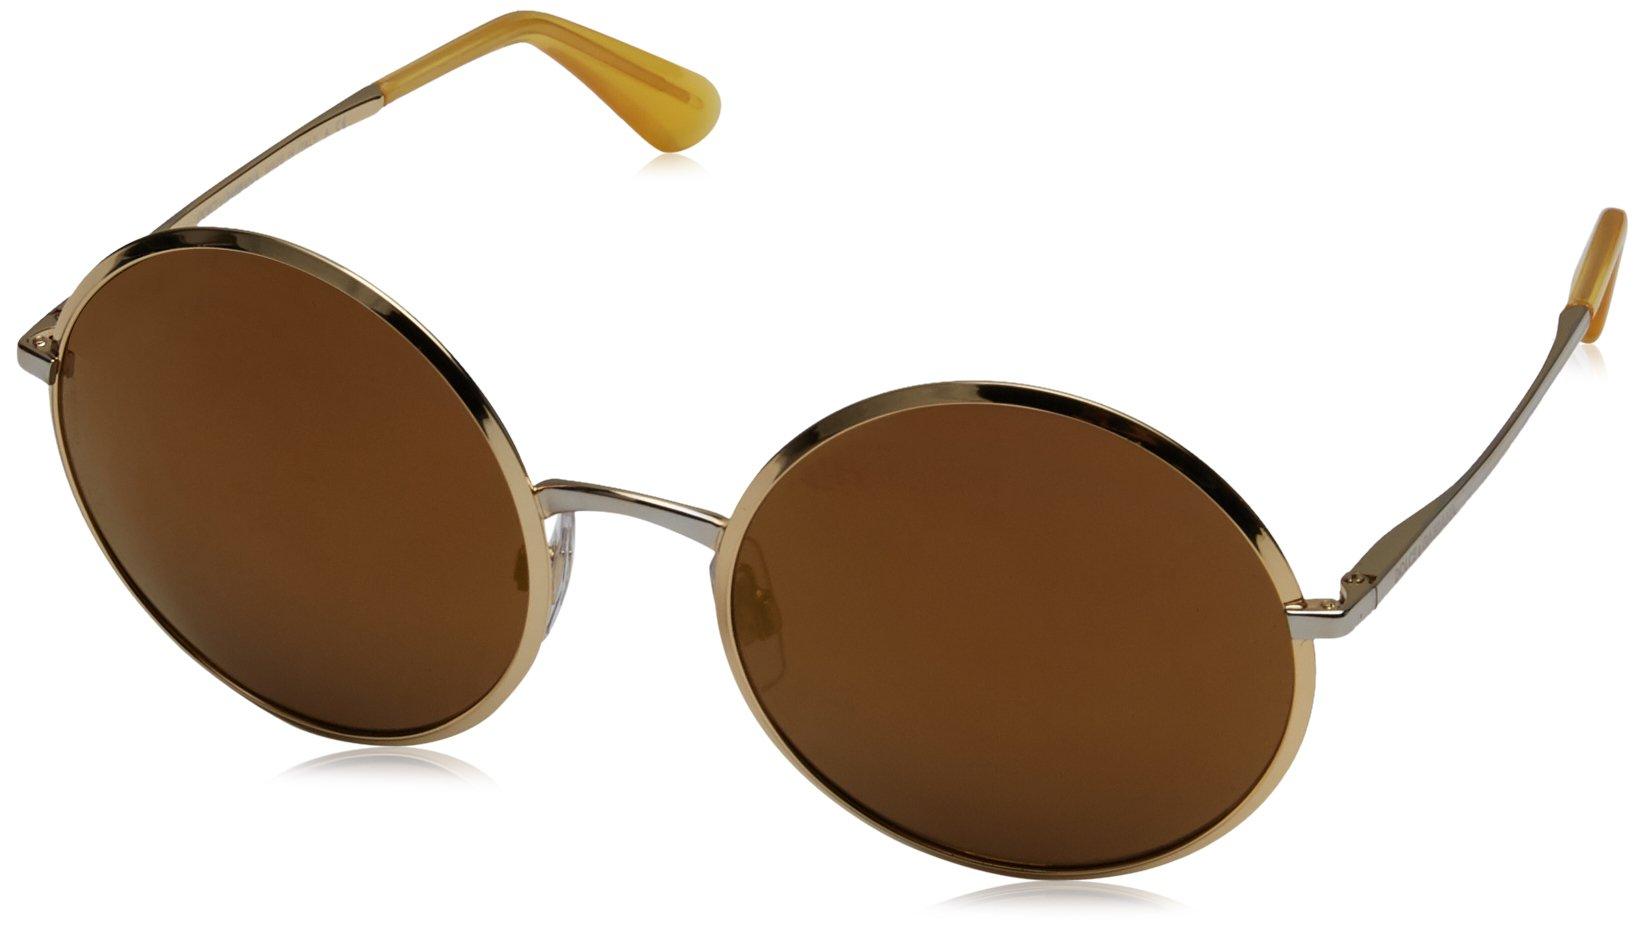 Dolce & Gabbana Women's Metal Woman Non-Polarized Iridium Round Sunglasses, Gold, 56 mm